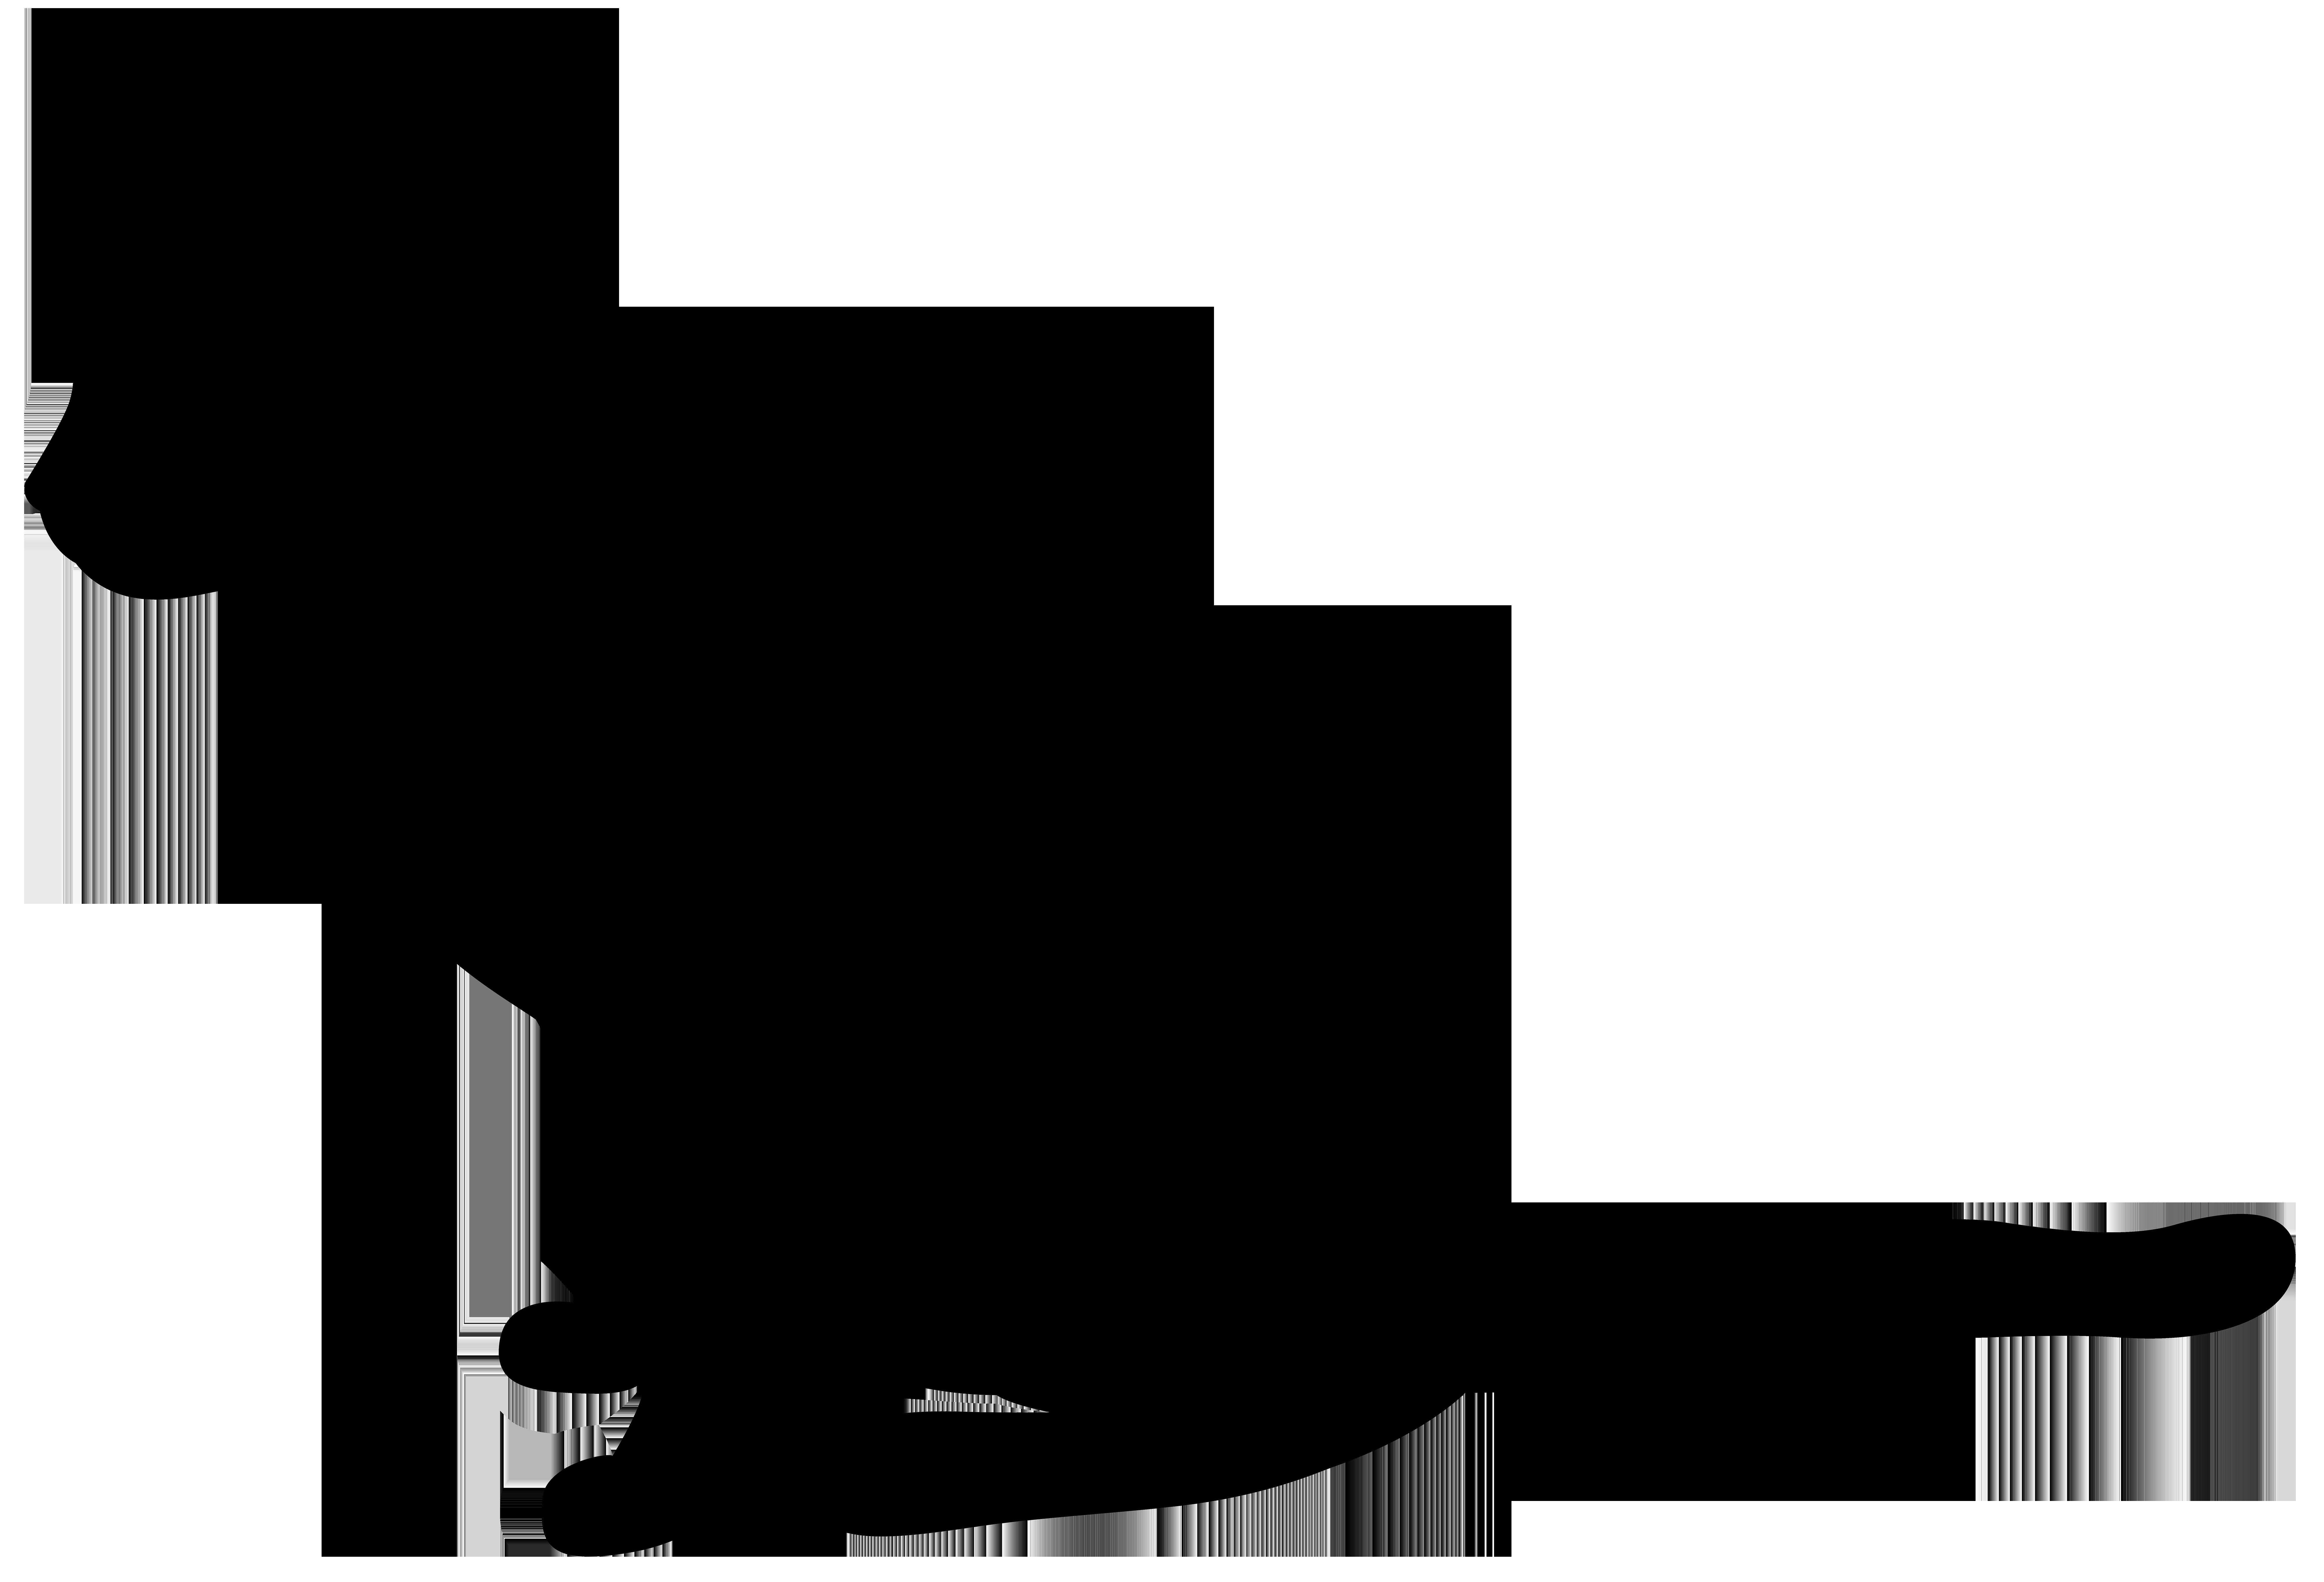 8000x5447 Cat Silhouette Png Clip Art Imageu200b Gallery Yopriceville